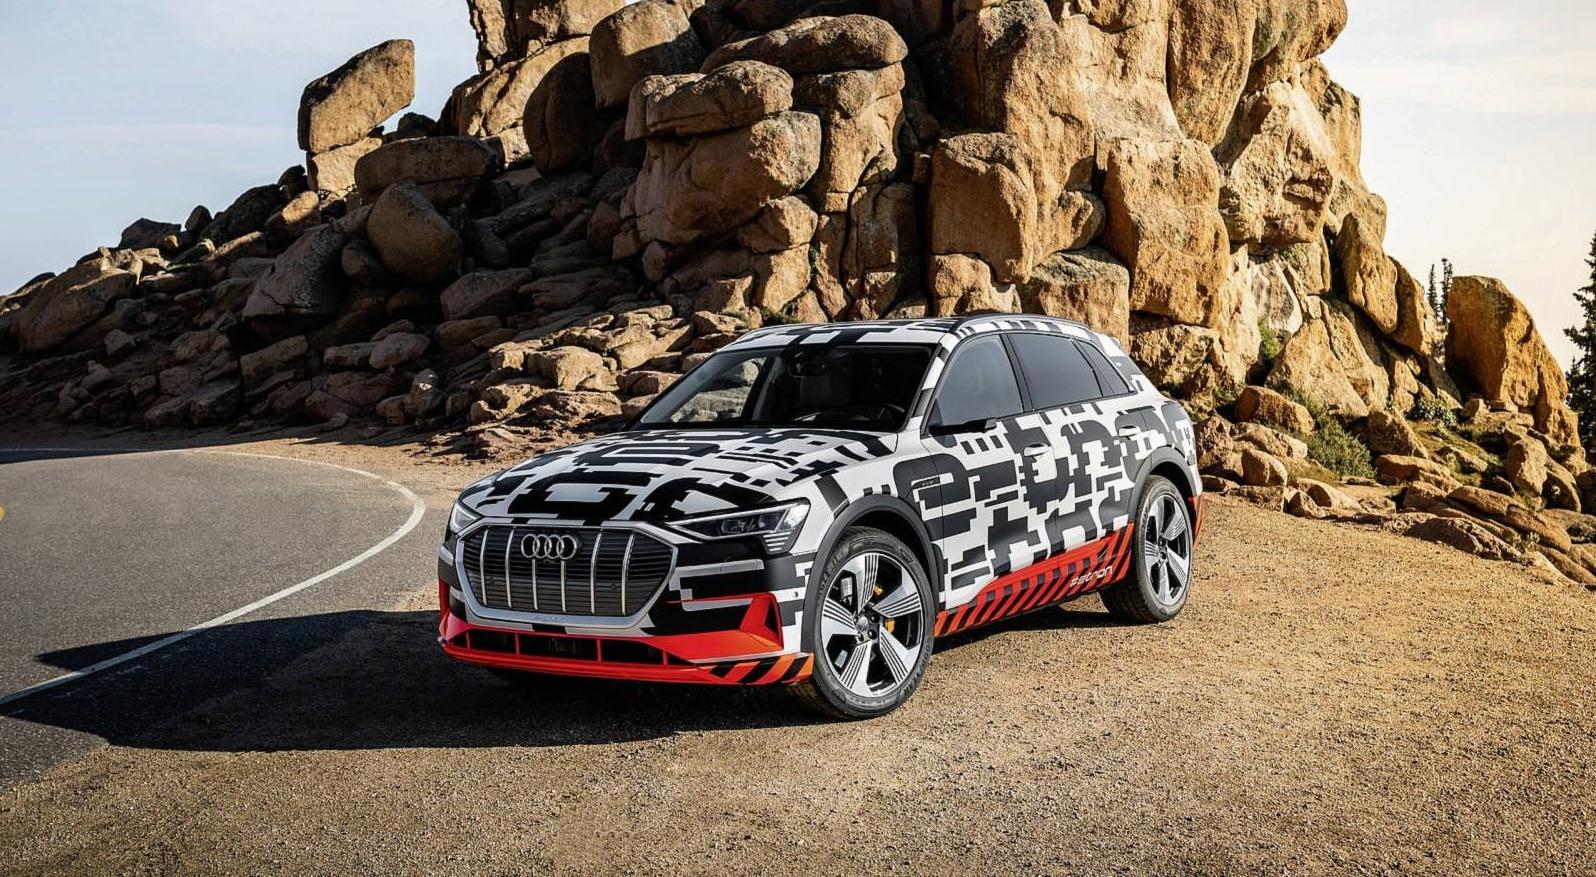 Audi-e-tron-Pikes-Peak-10959